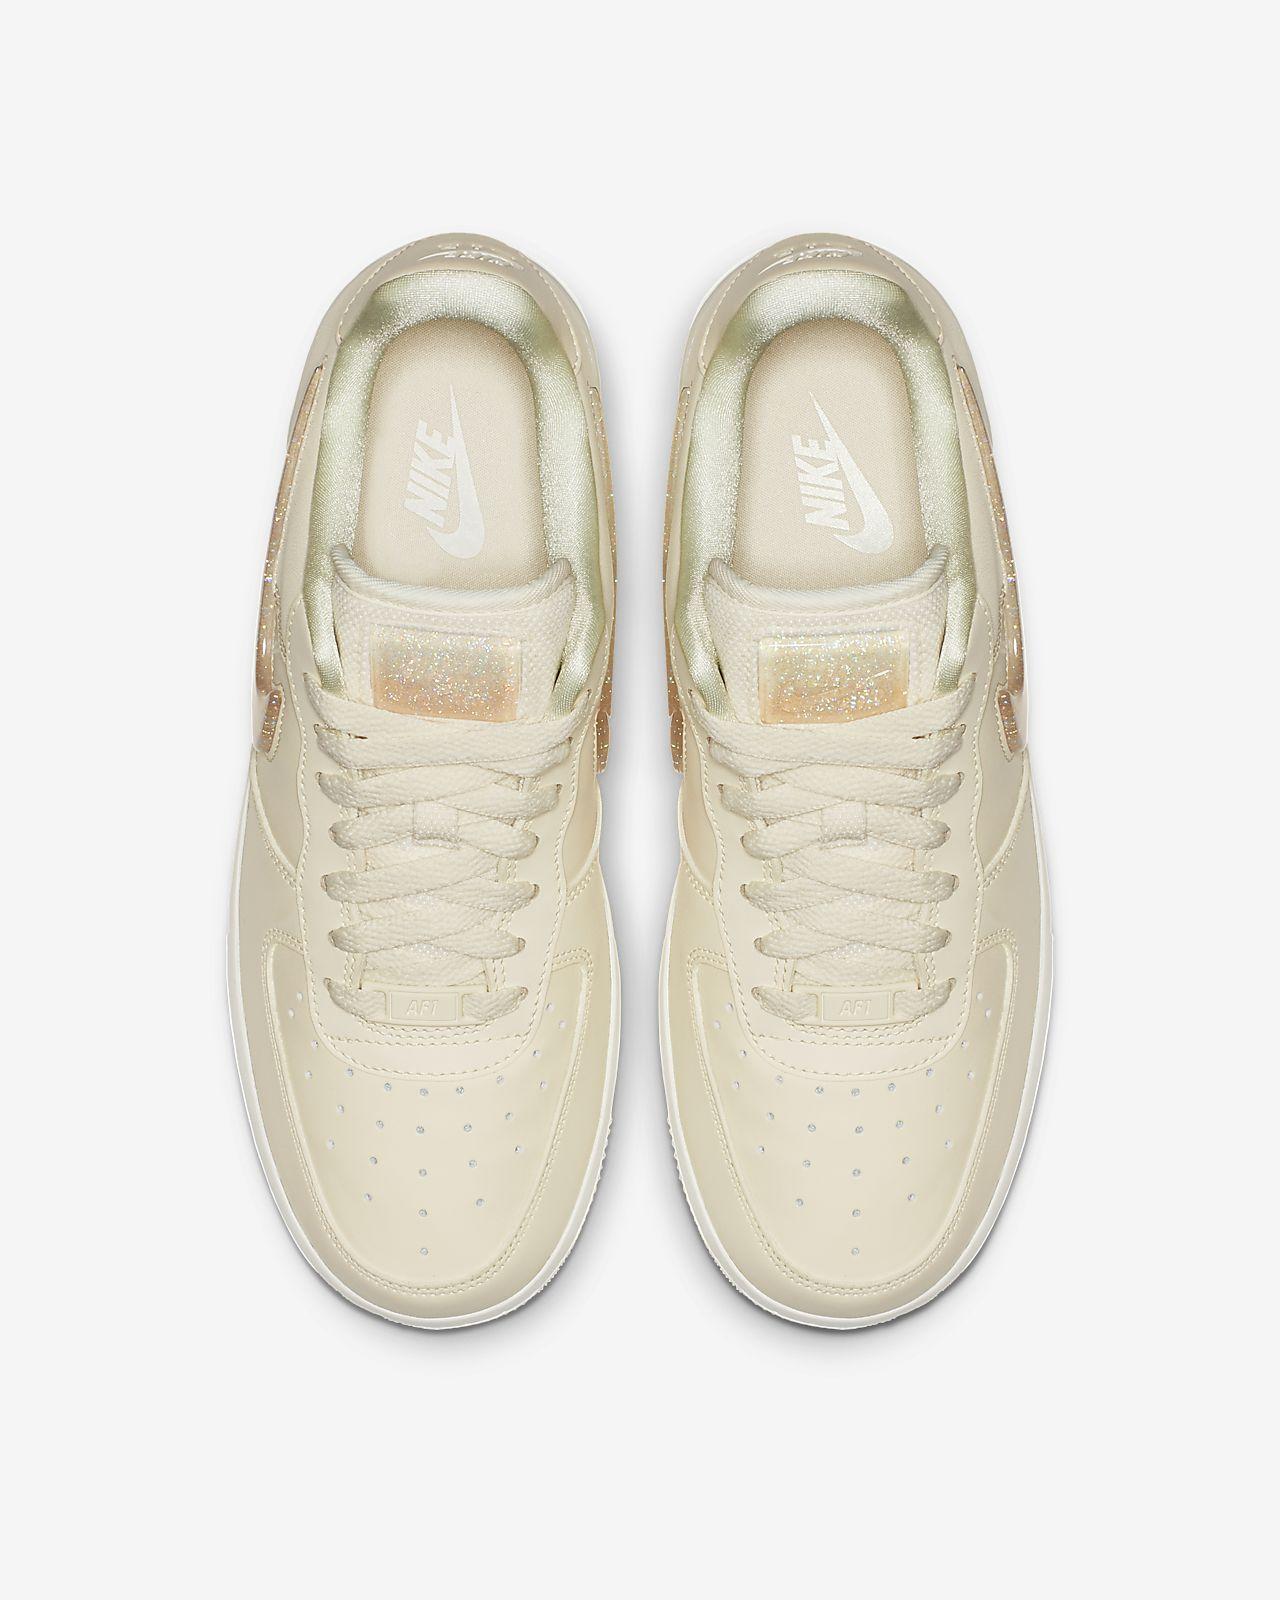 low priced 59939 2b332 ... Nike Air Force 1 07 SE Premium Womens Shoe